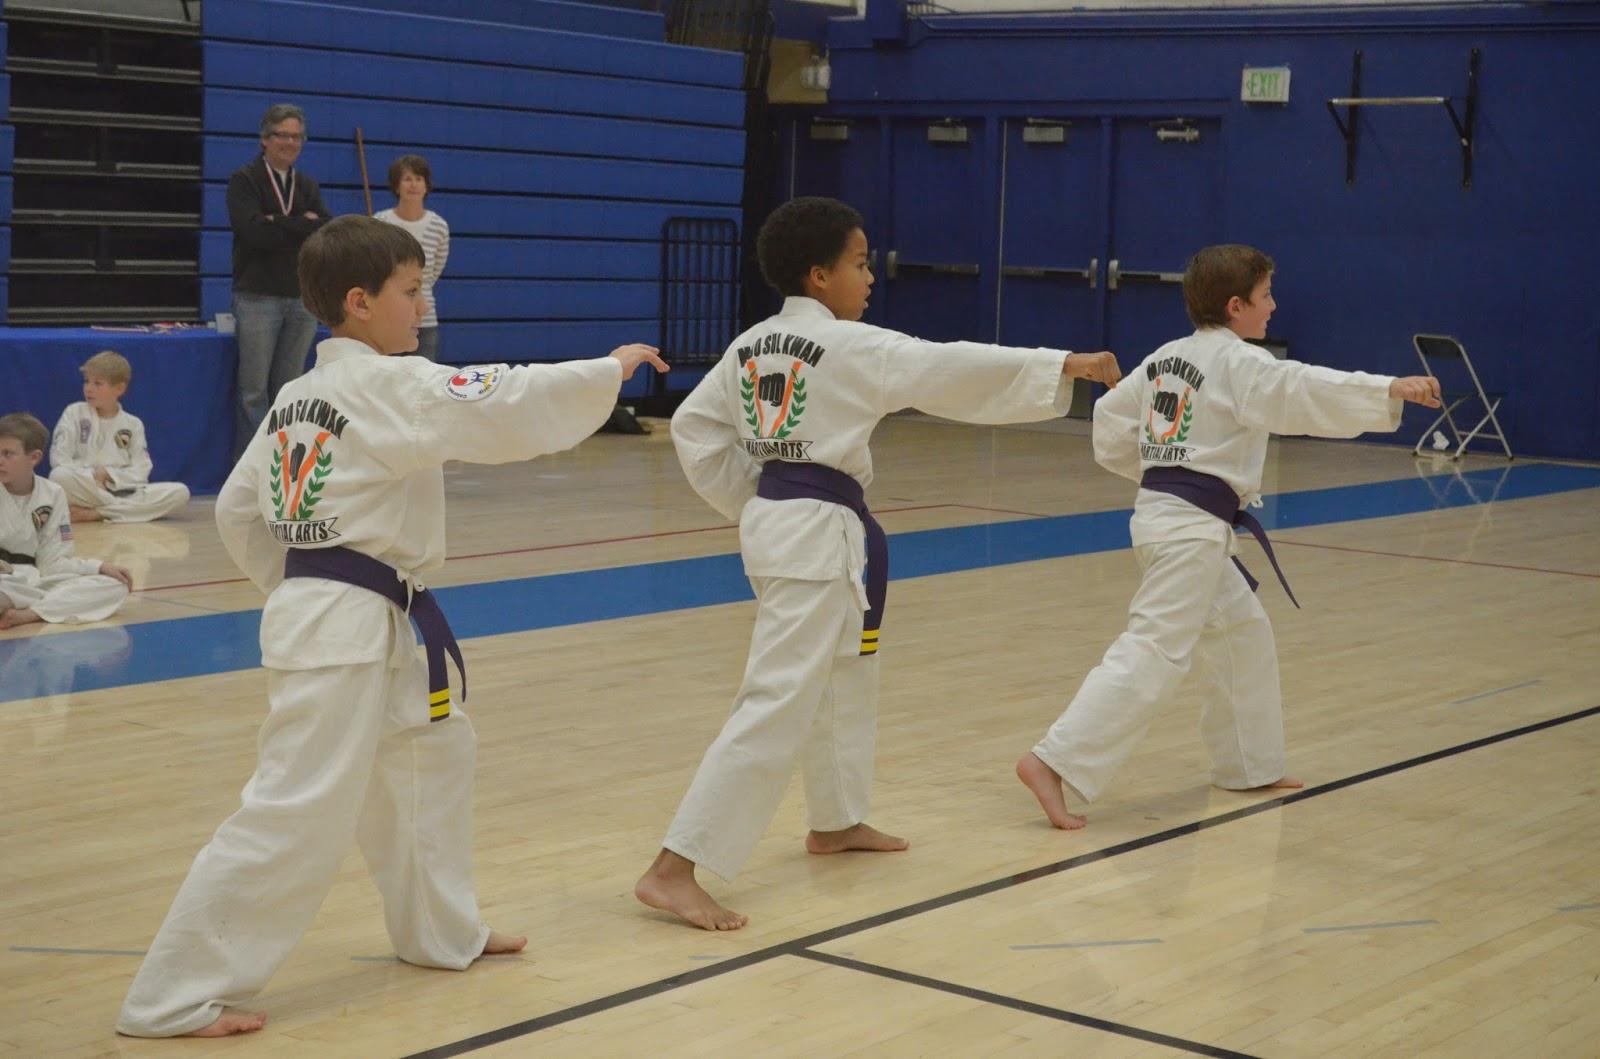 Purple belt martial arts kids doing a patterned movement form